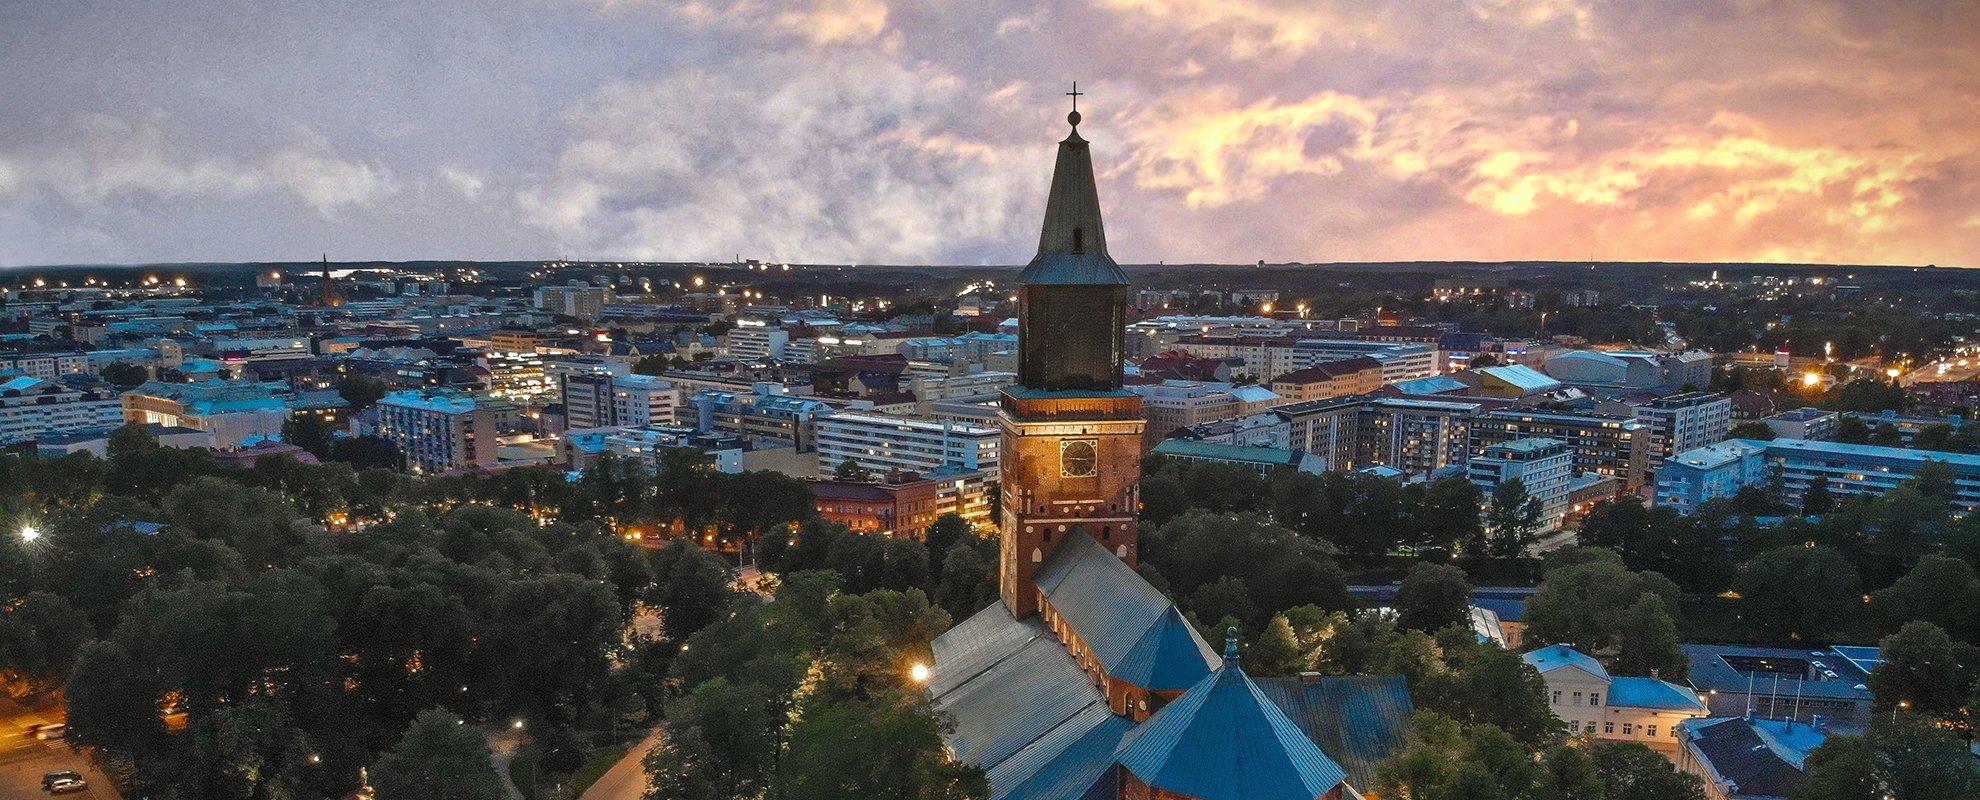 ibes Amslift OY is based in Turku